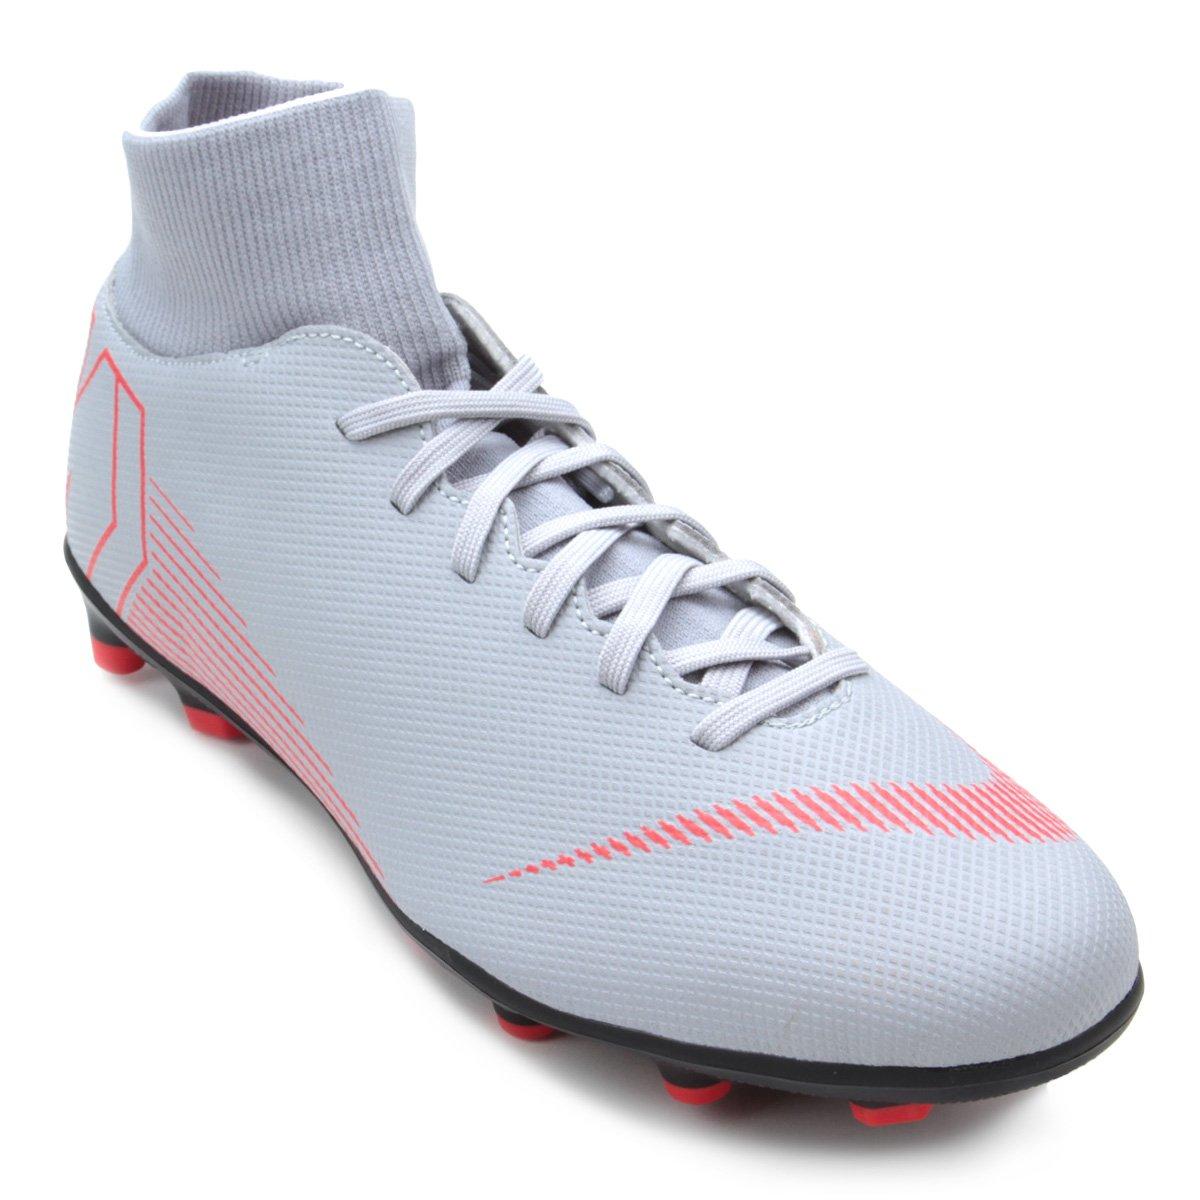 Chuteira Campo Nike Mercurial Superfly 6 Club - Cinza e Preto ... 13deb87e0499c